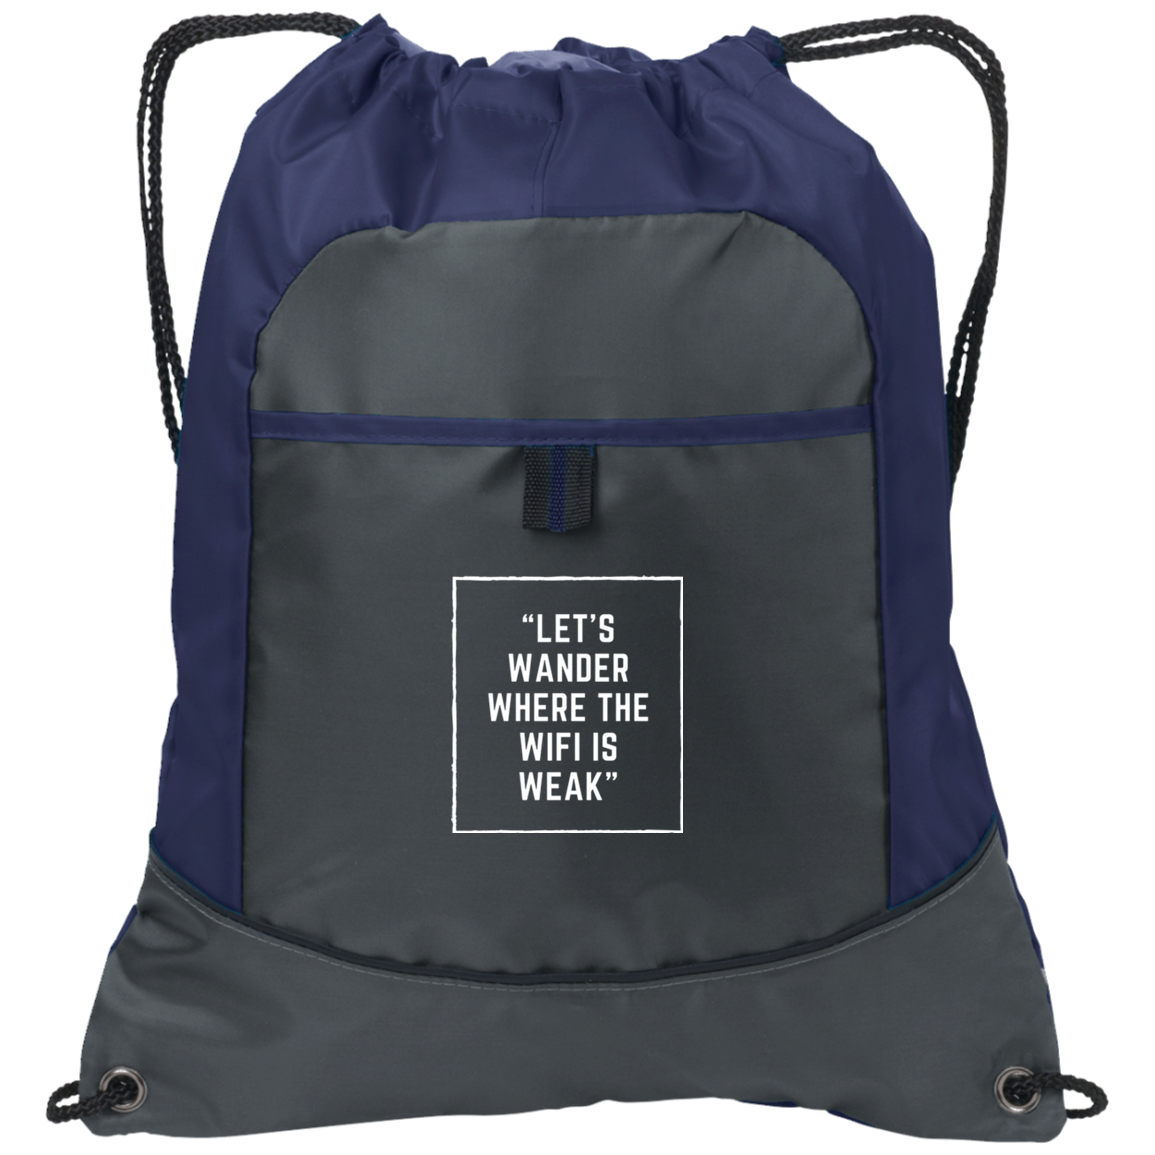 Let S Wander Where The Wifi Is Weak Cinch Pack Custom Drawstring Bags Port Authority Bags